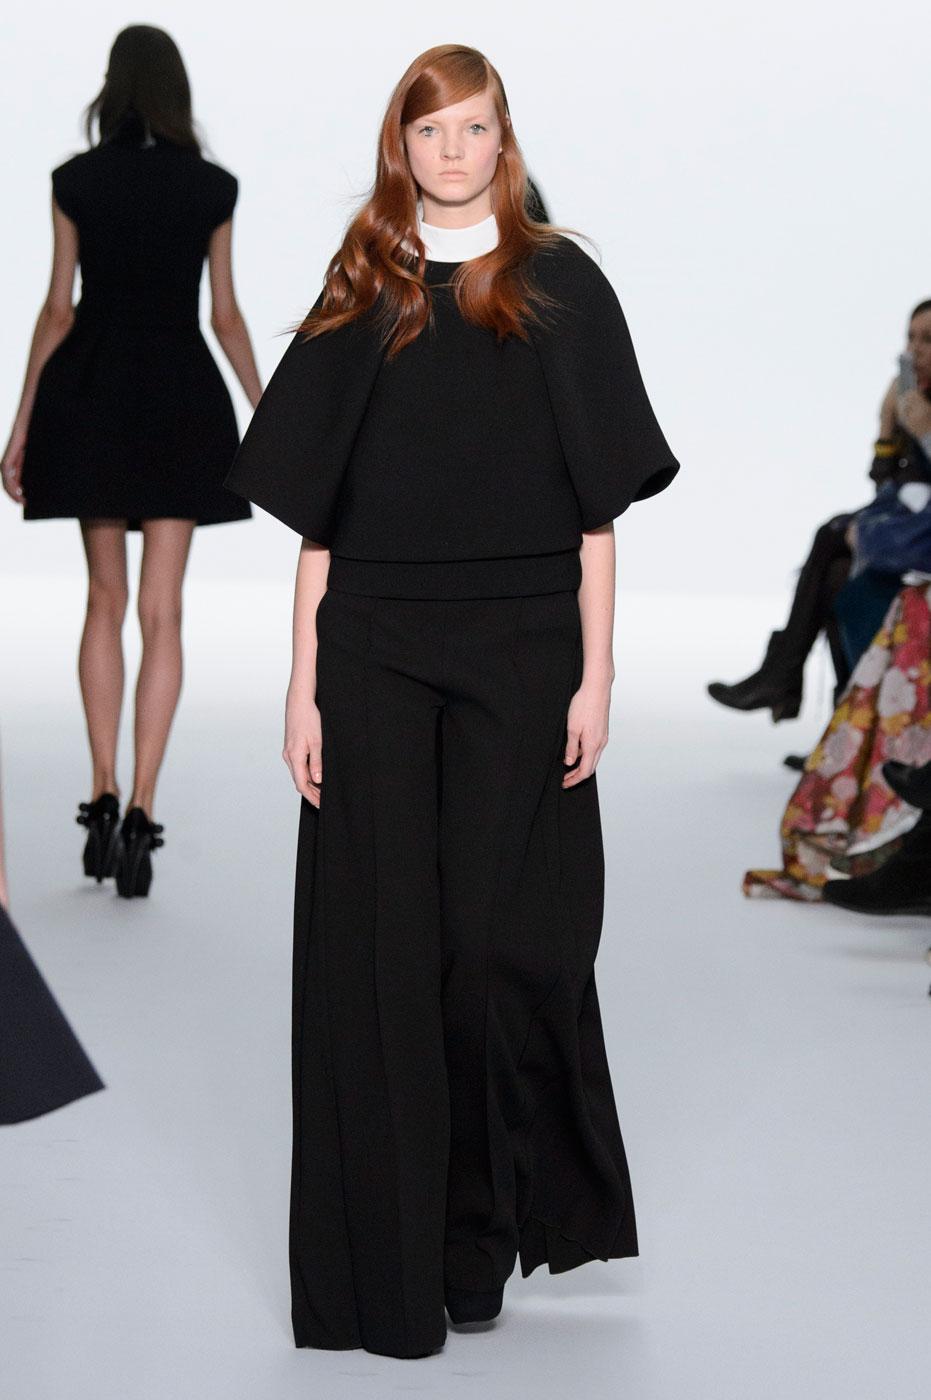 Kayek-fashion-runway-show-haute-couture-paris-spring-summer-2015-the-impression-07